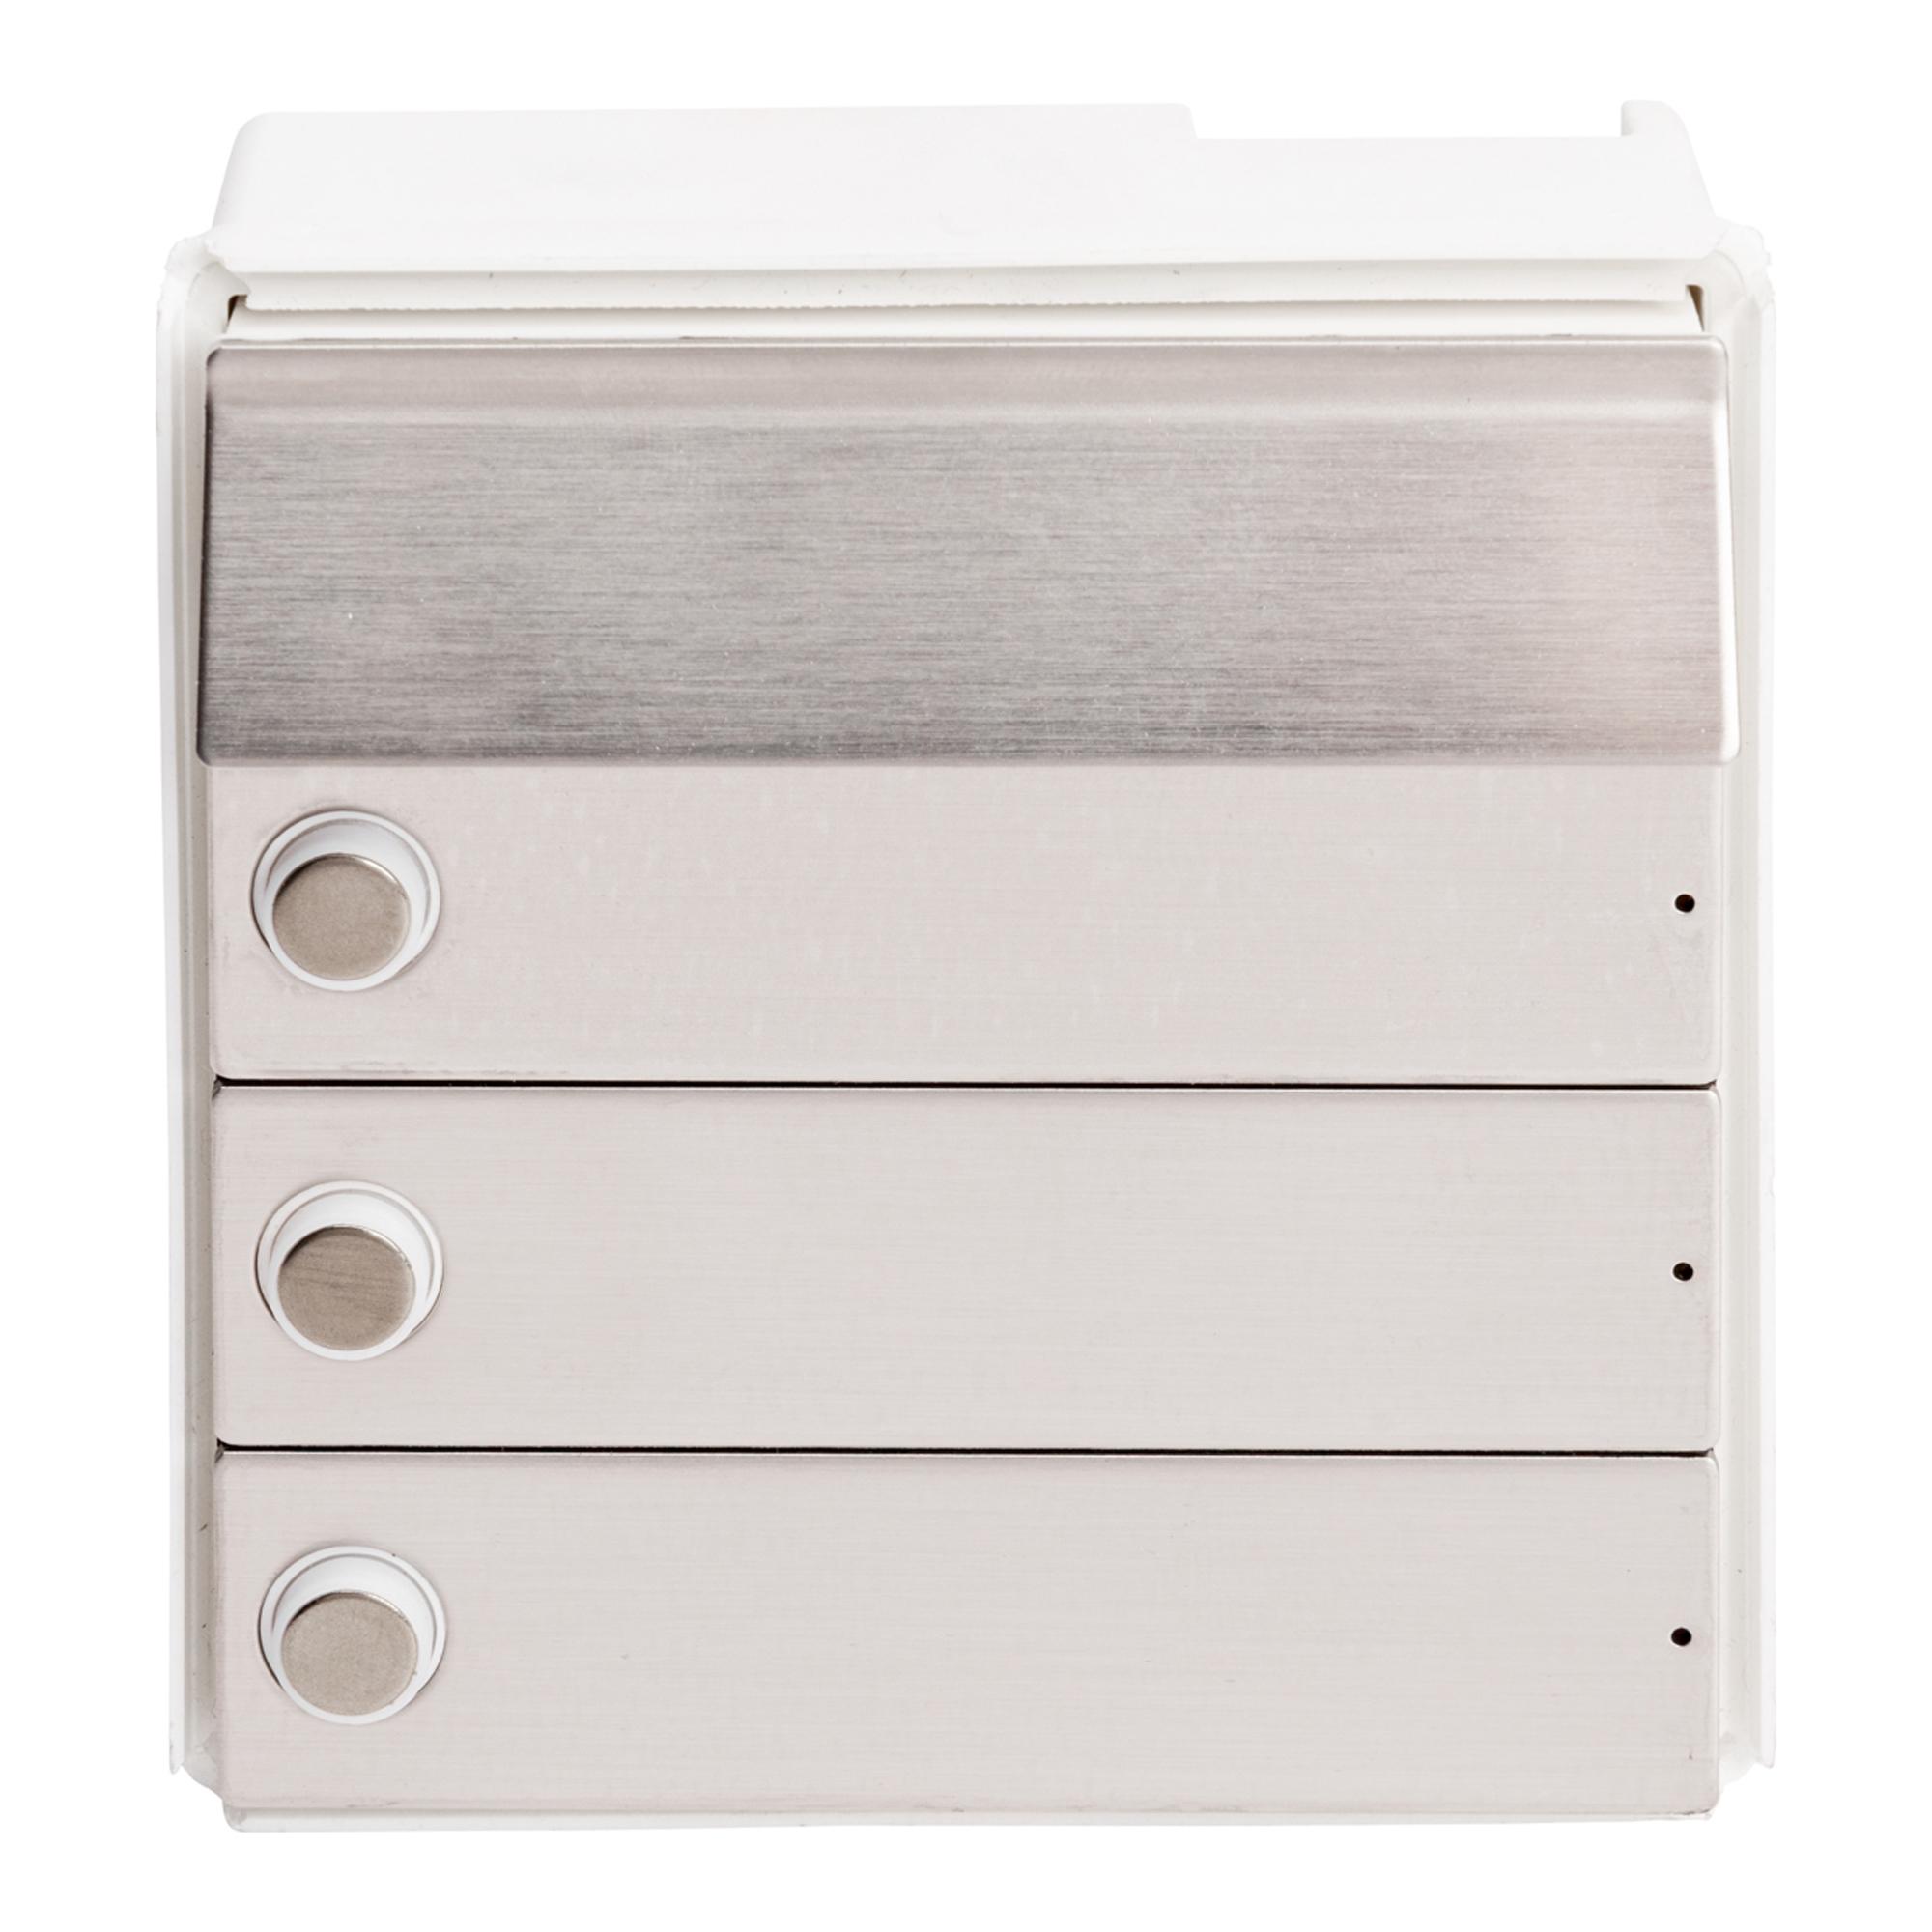 RENZ Tastenmodul RSA2 kompakt - 3 Klingeln-Edelstahl 97-9-85333